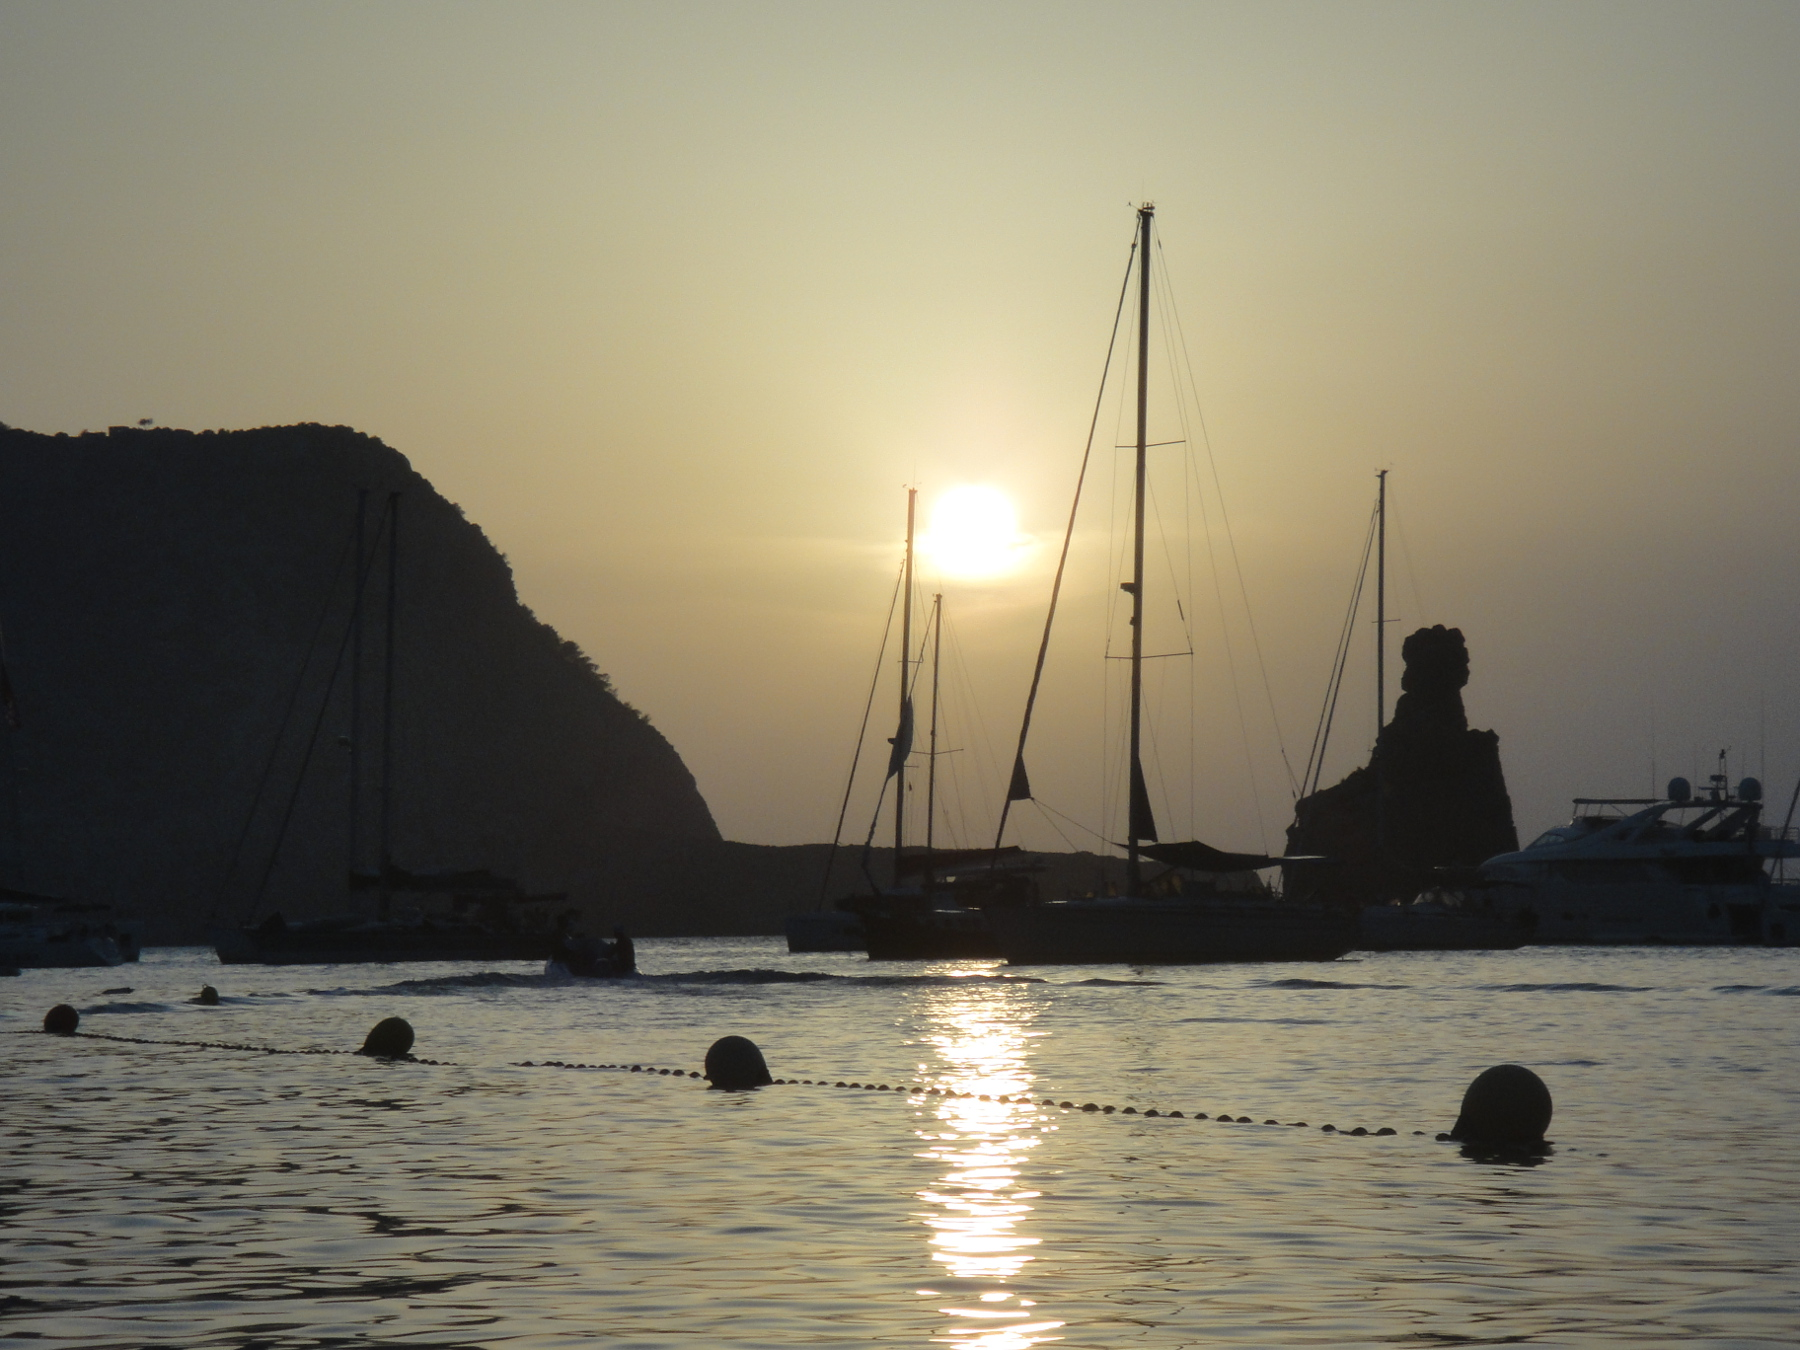 Sunset in Benirras, Ibiza